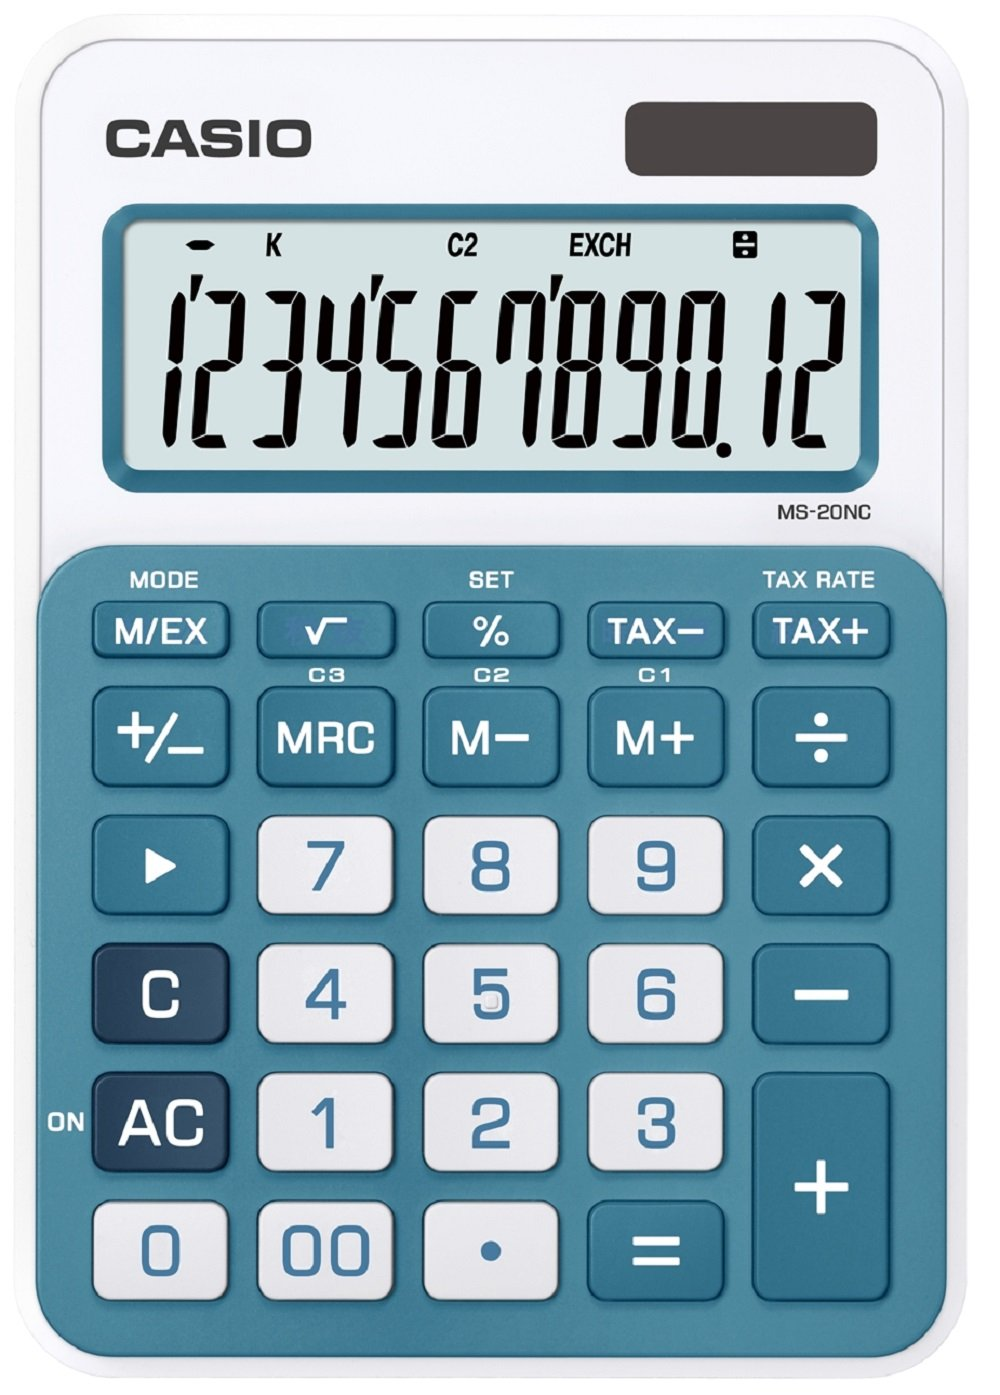 struttura di colore bianco//blu CASIO MS-20NC-BU calcolatrice da tavolo Display a 12 cifre